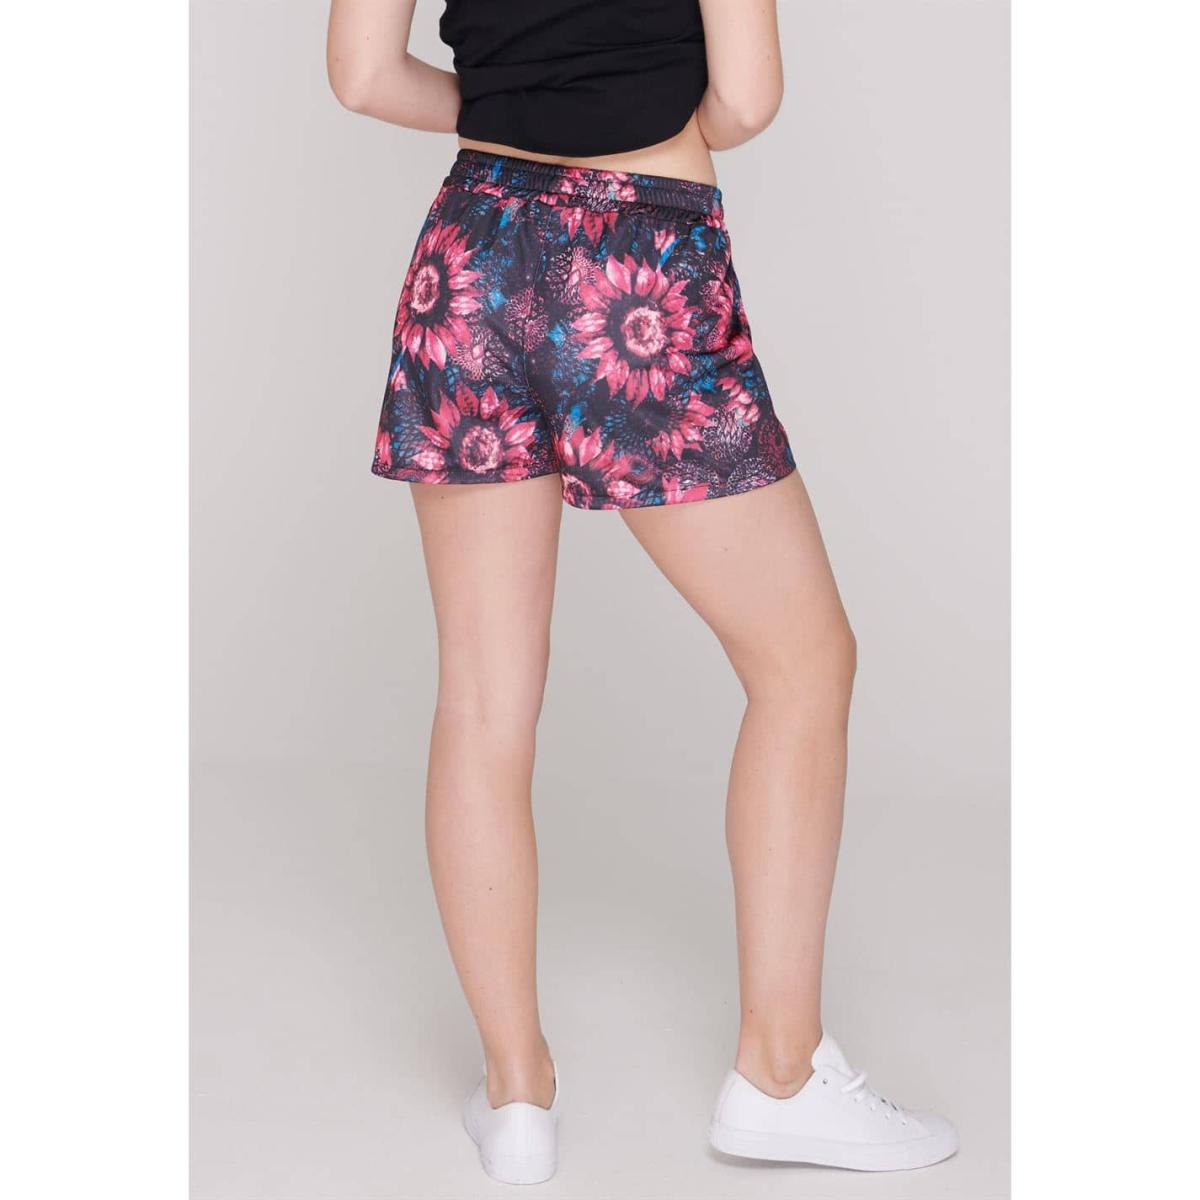 Everlast Track Kurzhose Shorts Damen